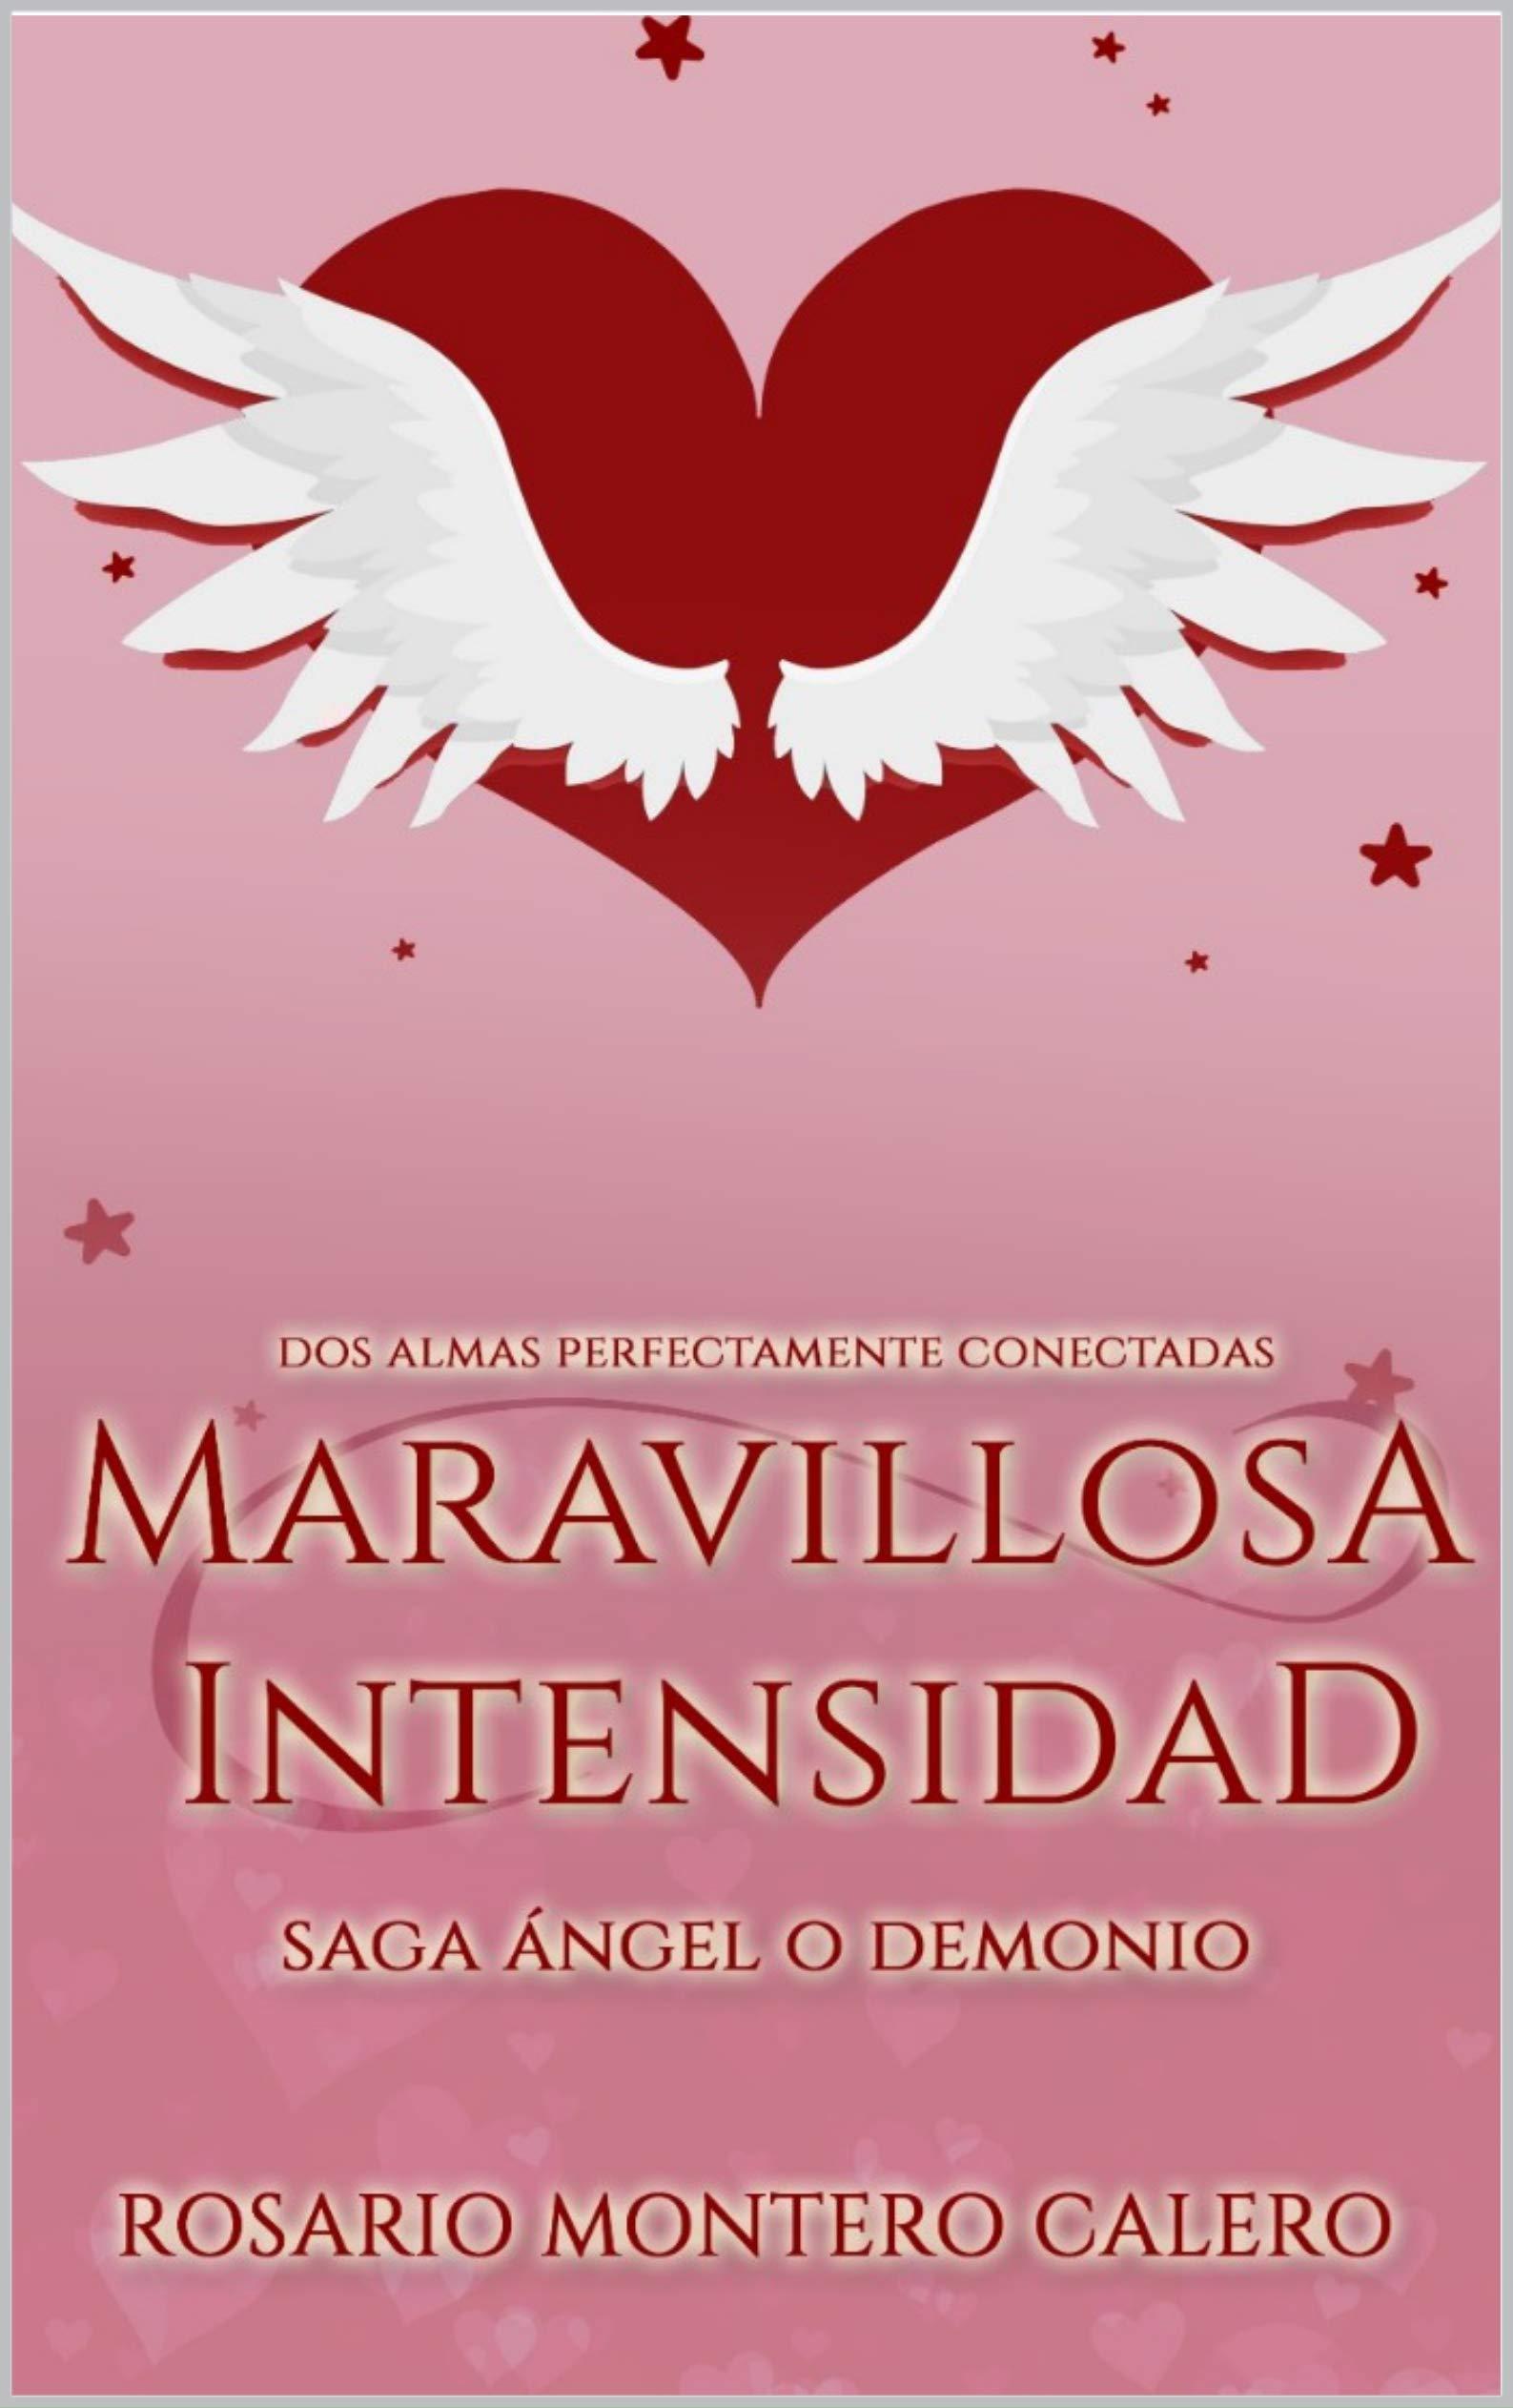 Maravillosa Intensidad: Saga: Ángel o Demonio